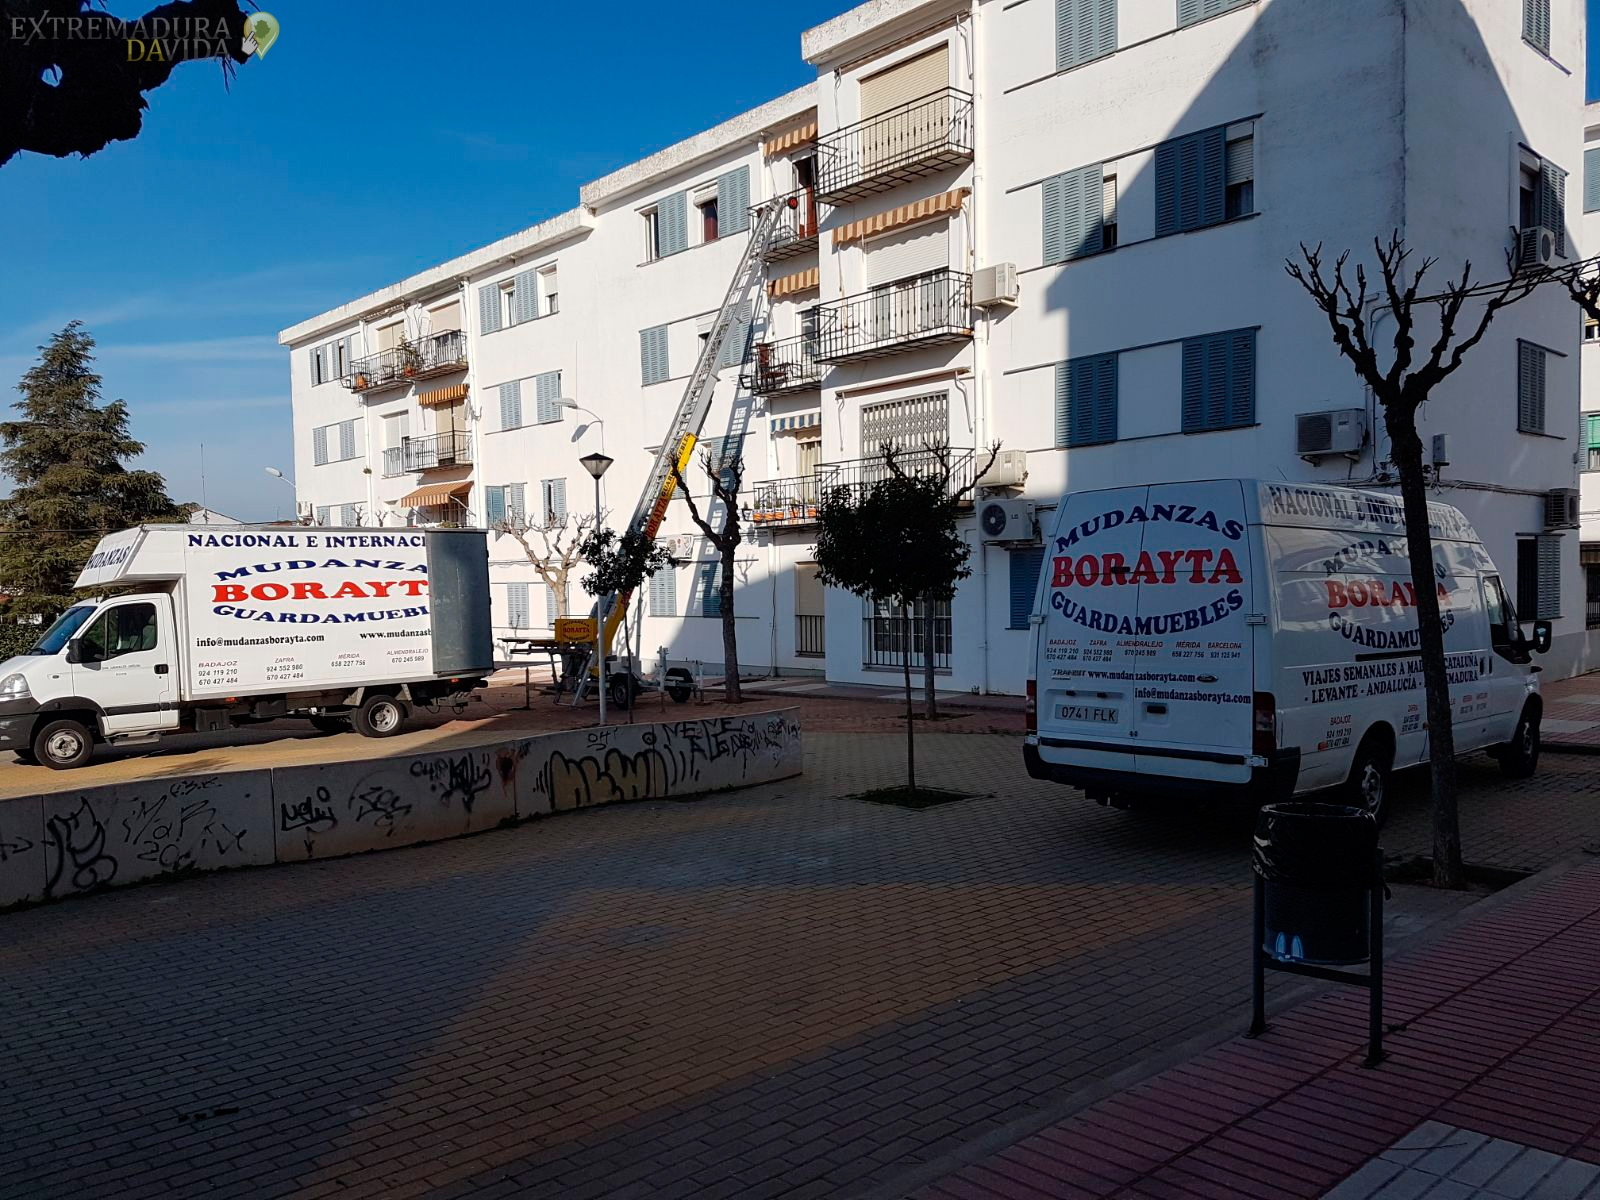 Mudanzas Boryata Guardamuebles en Badajoz,